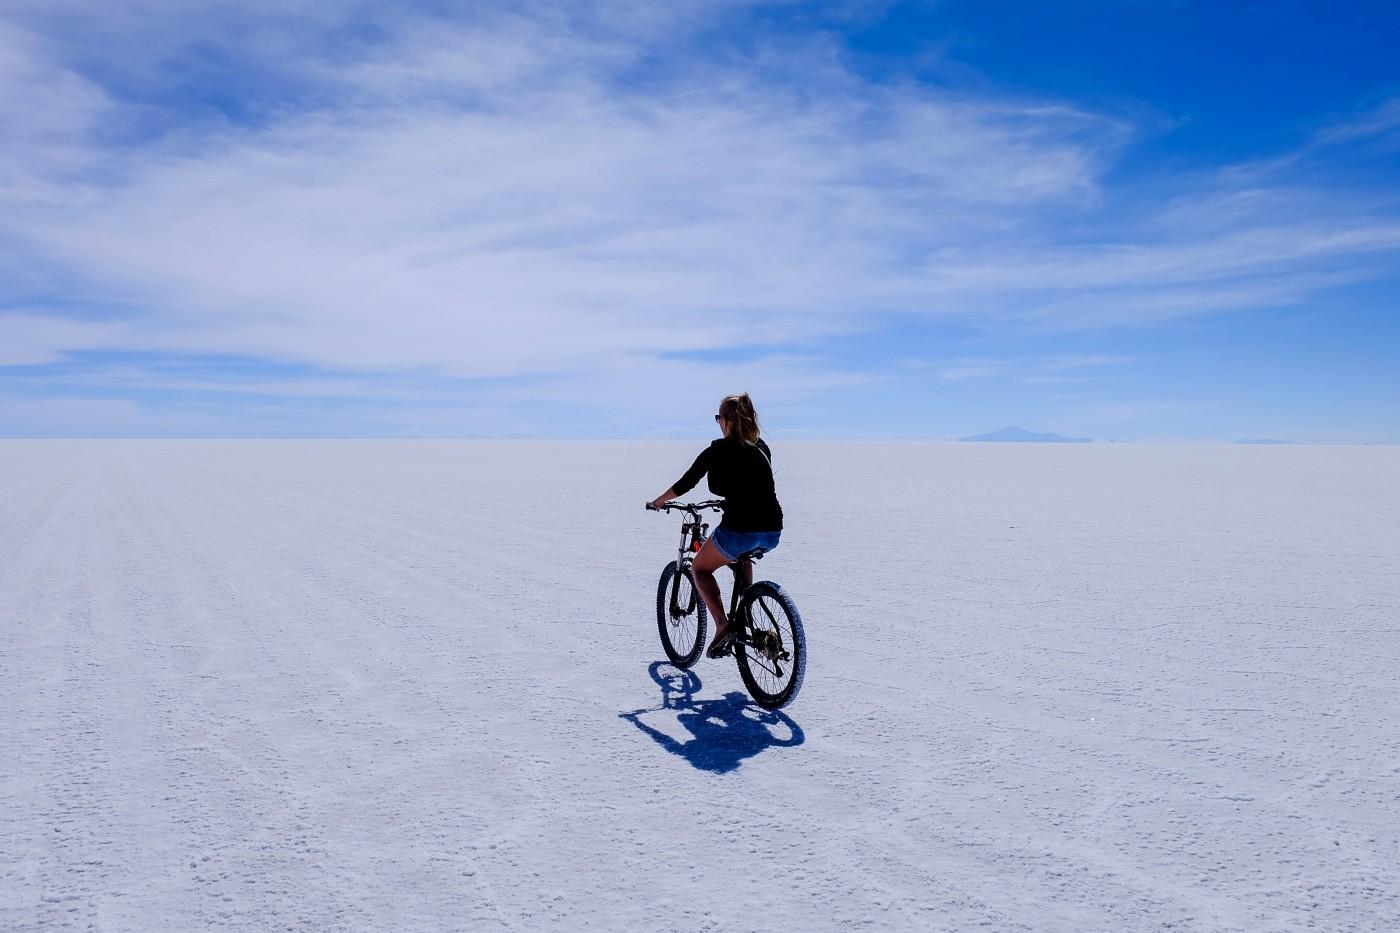 Photos of Salar de Uyuni to Spark Your Wanderlust